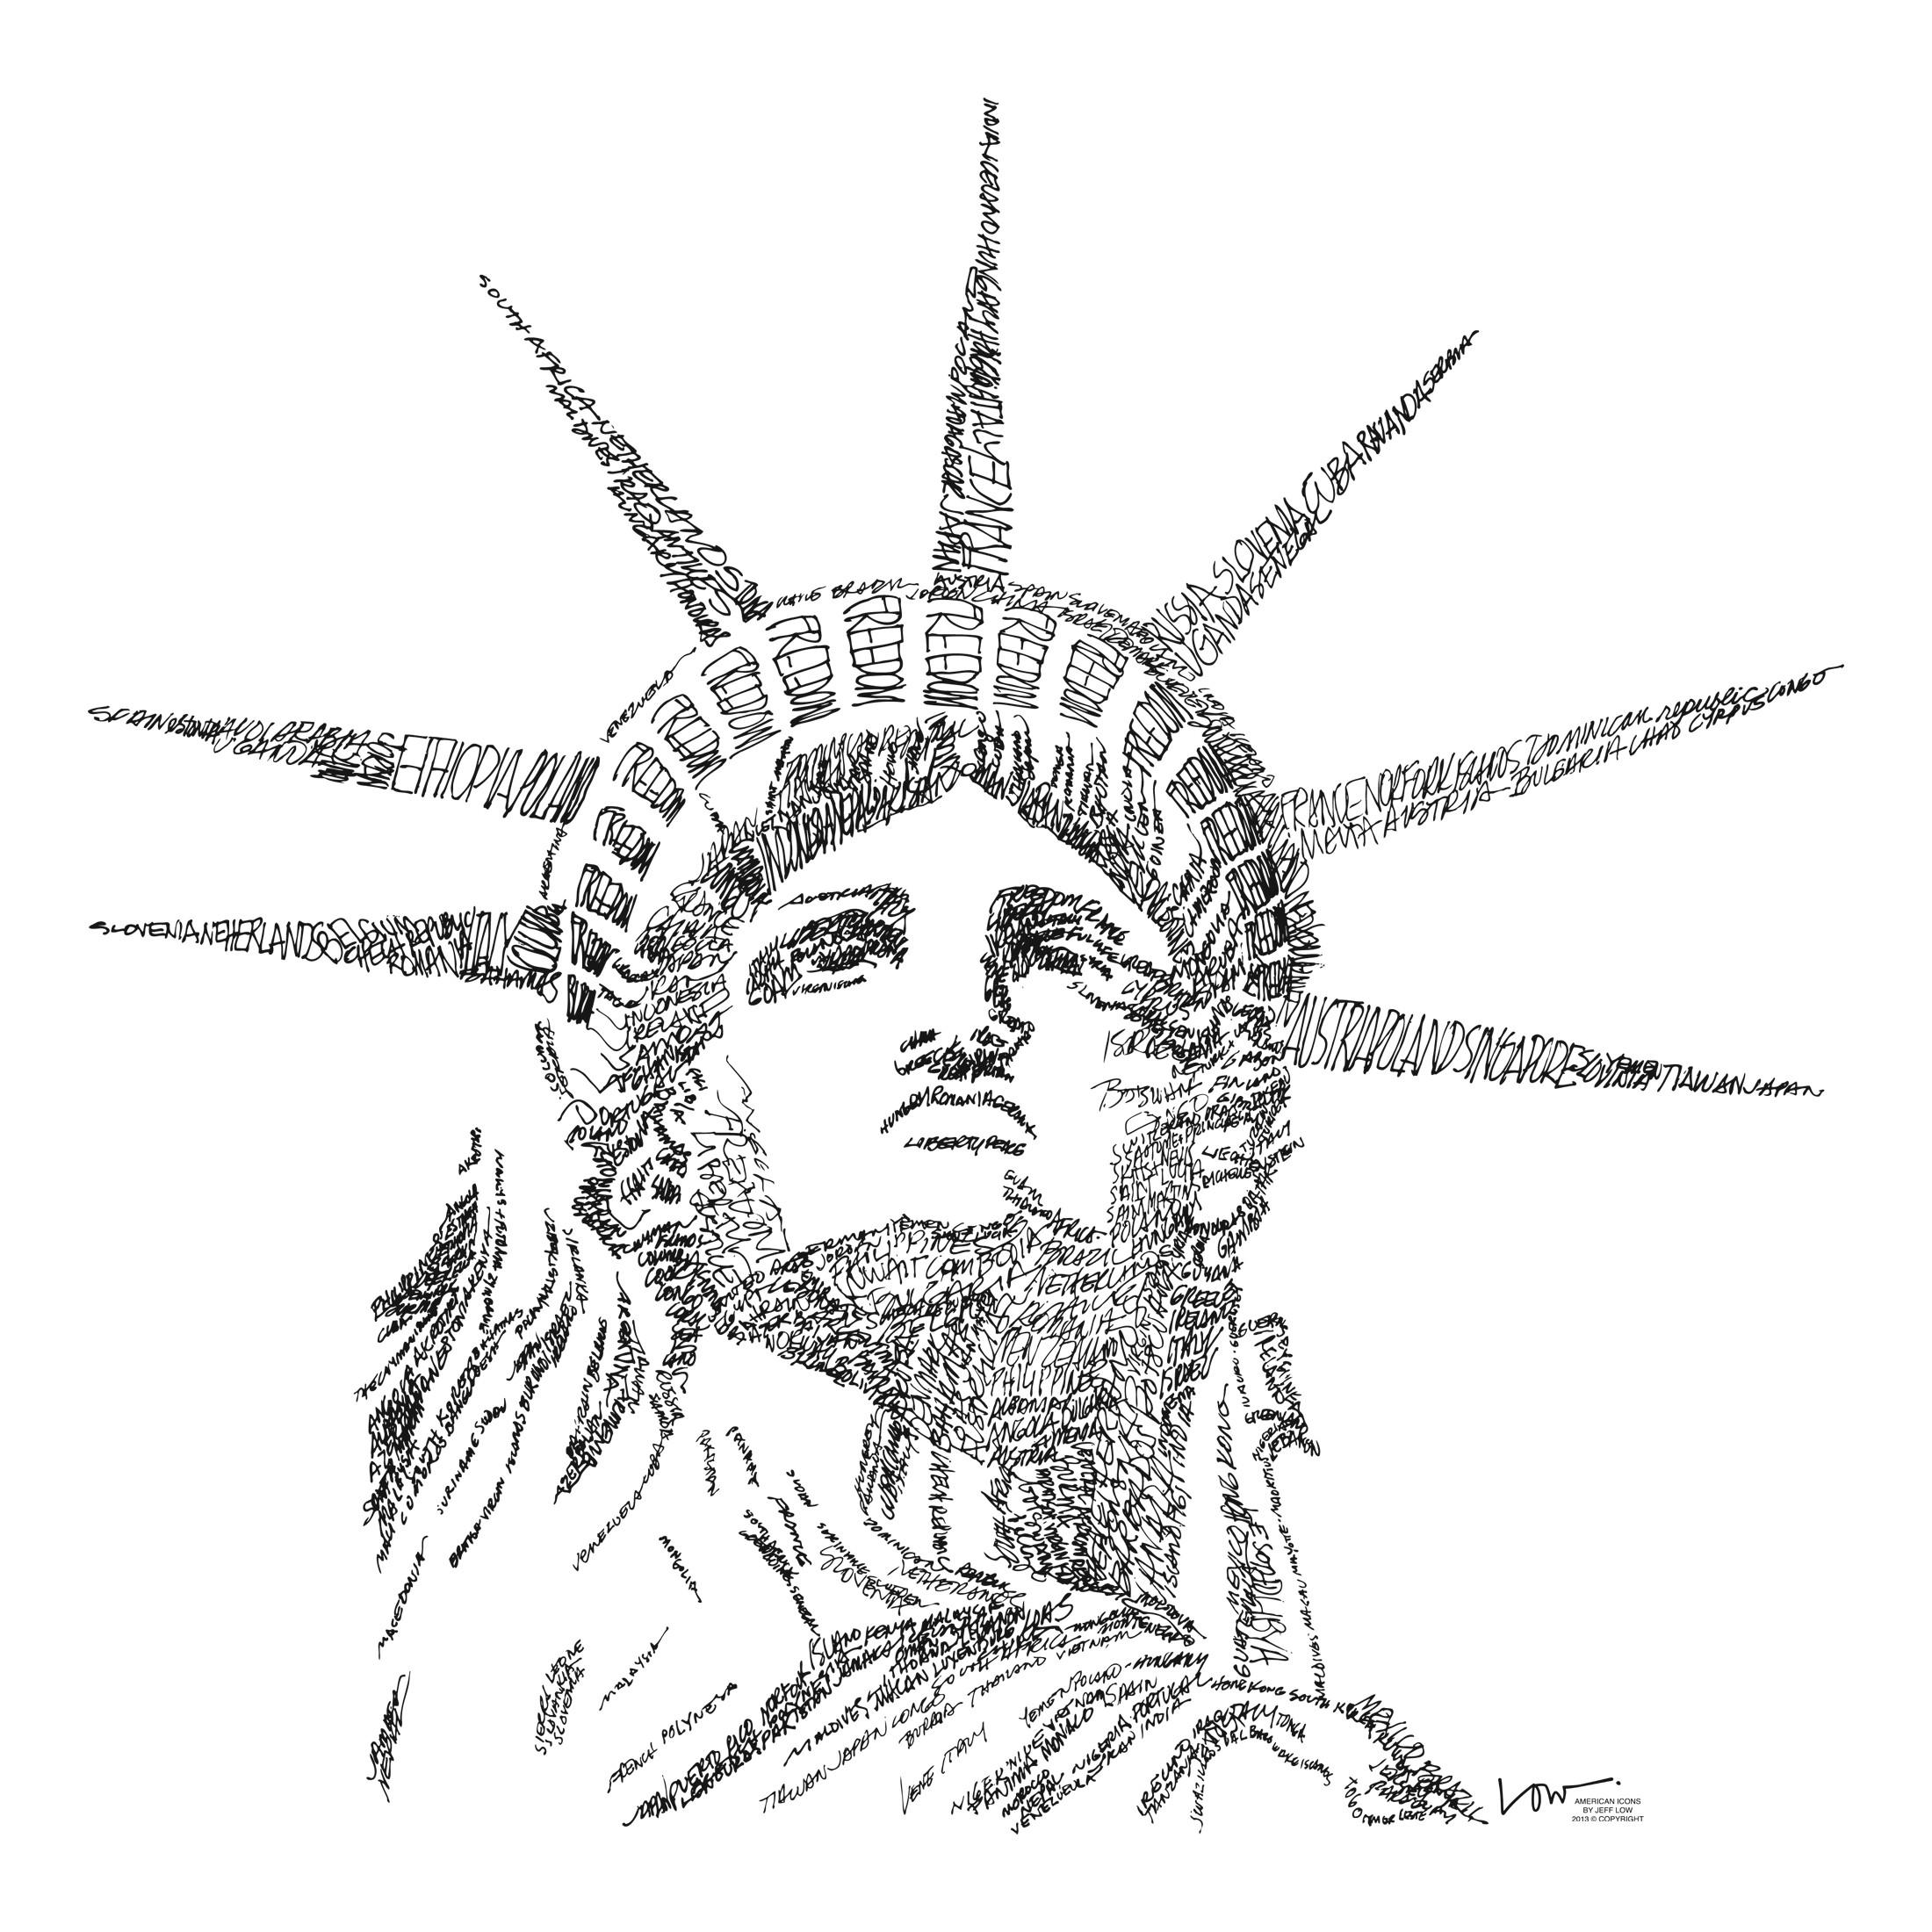 2200x2200 Chrysler Building